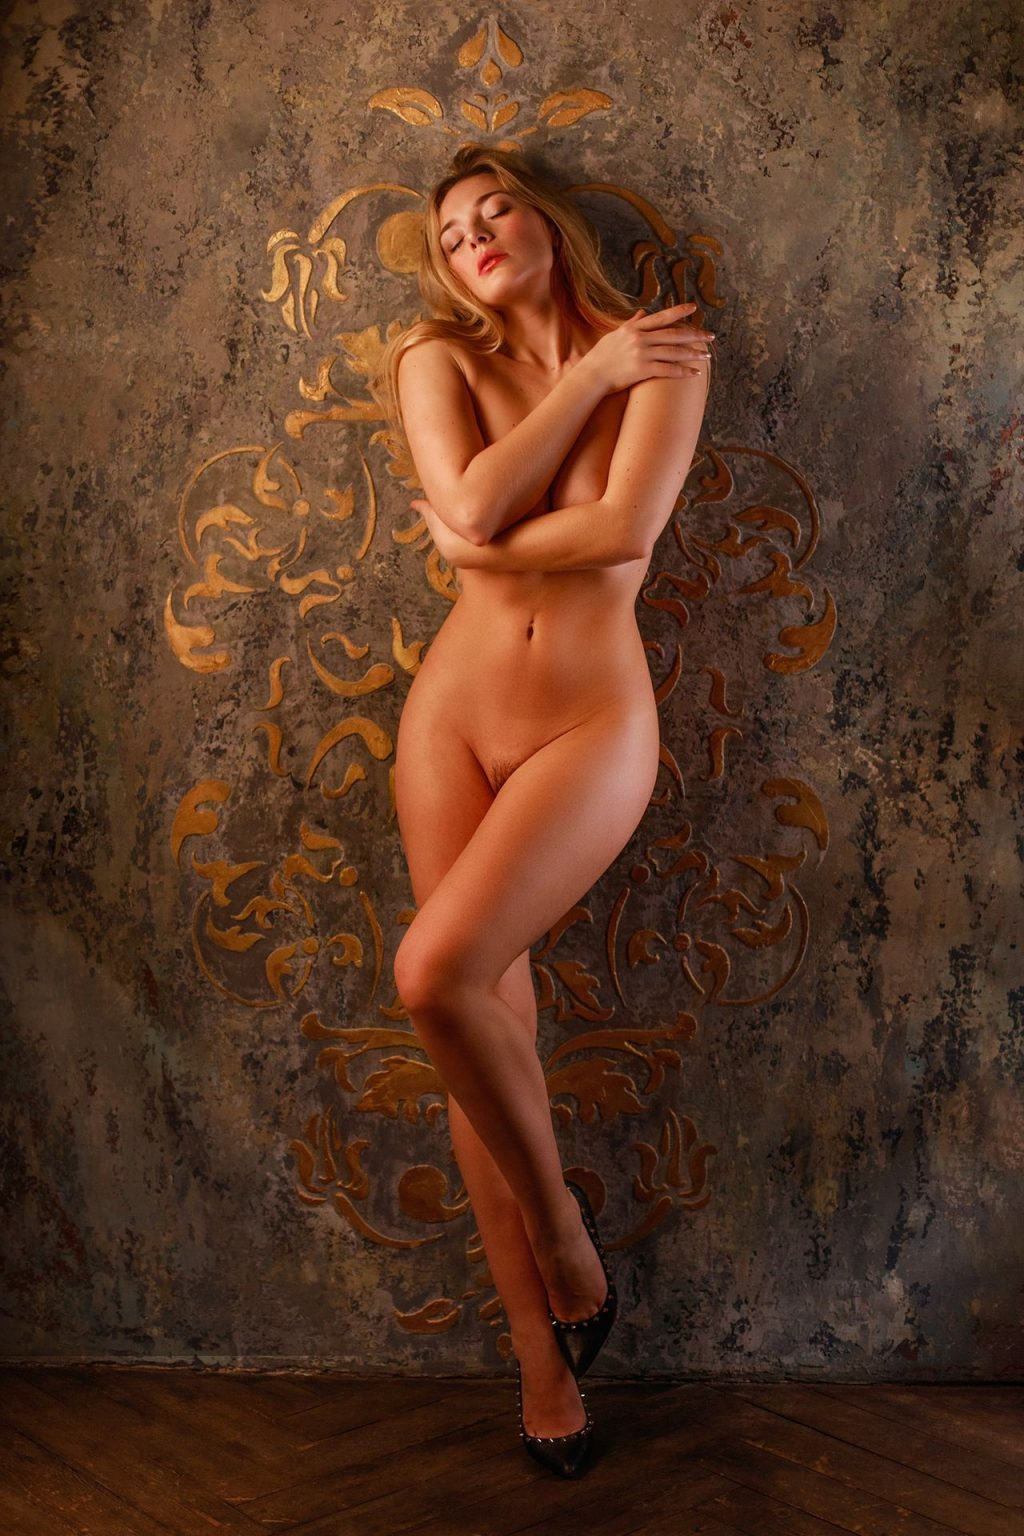 Alisa Tomei Porn olga kobzar – #thefappening